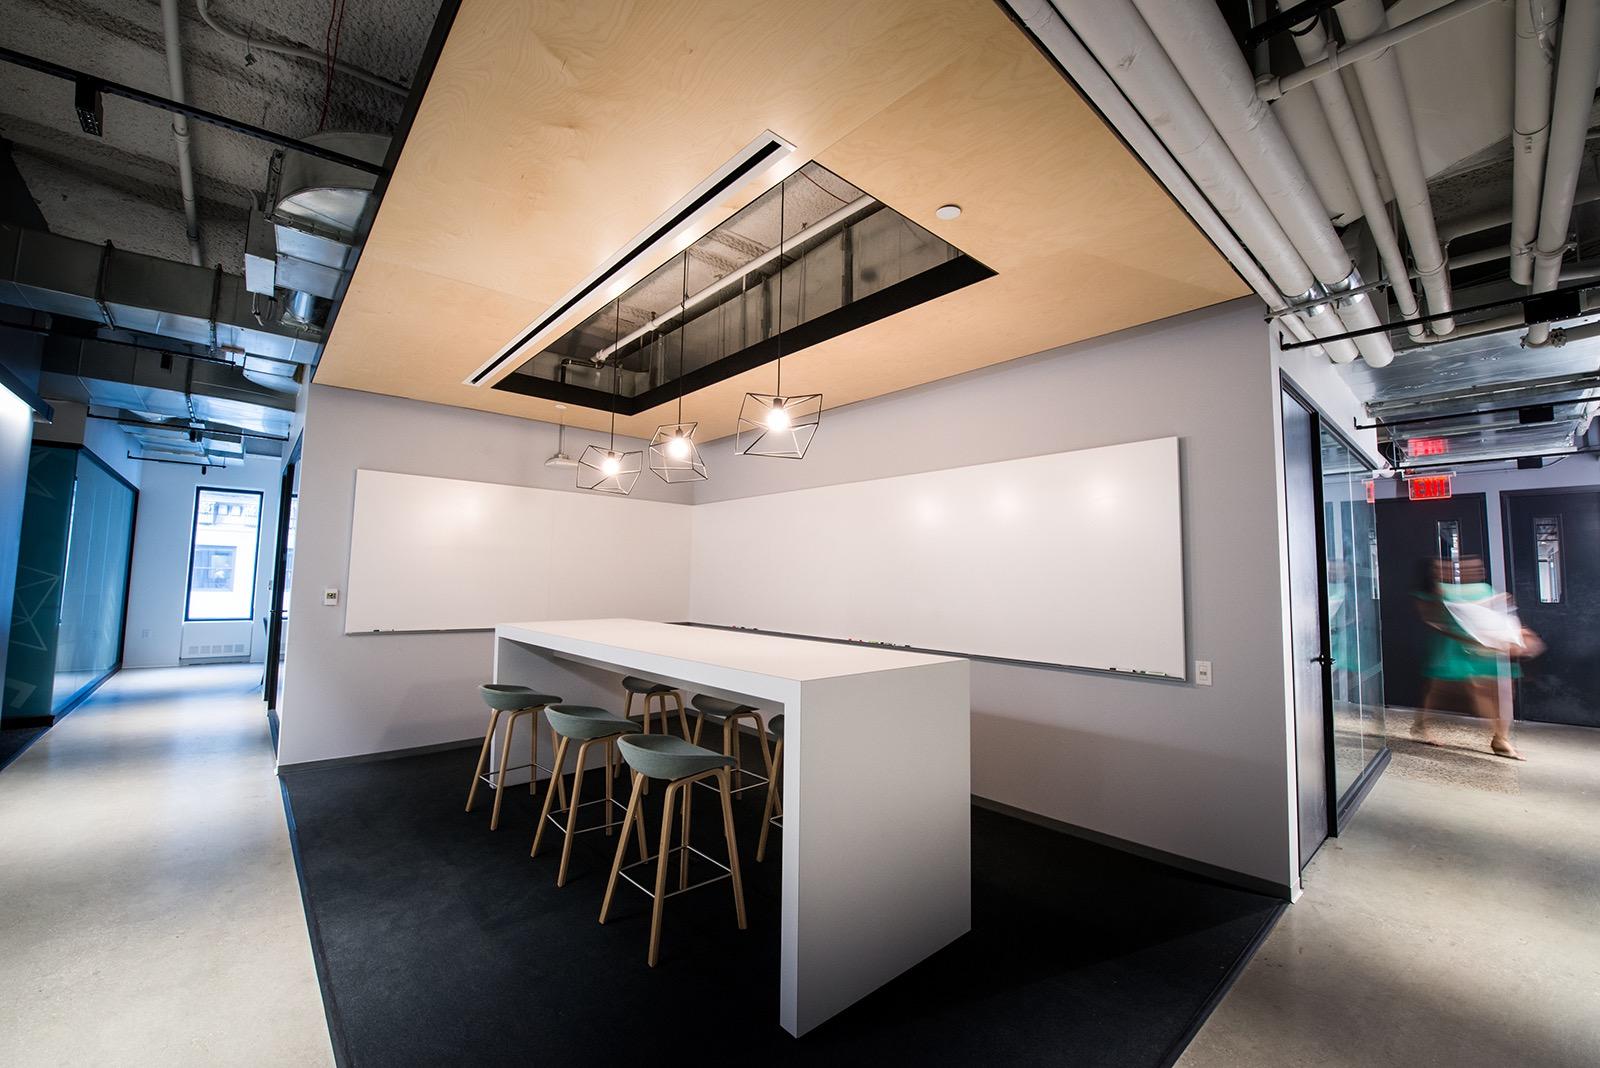 vox-media-nyc-office-11